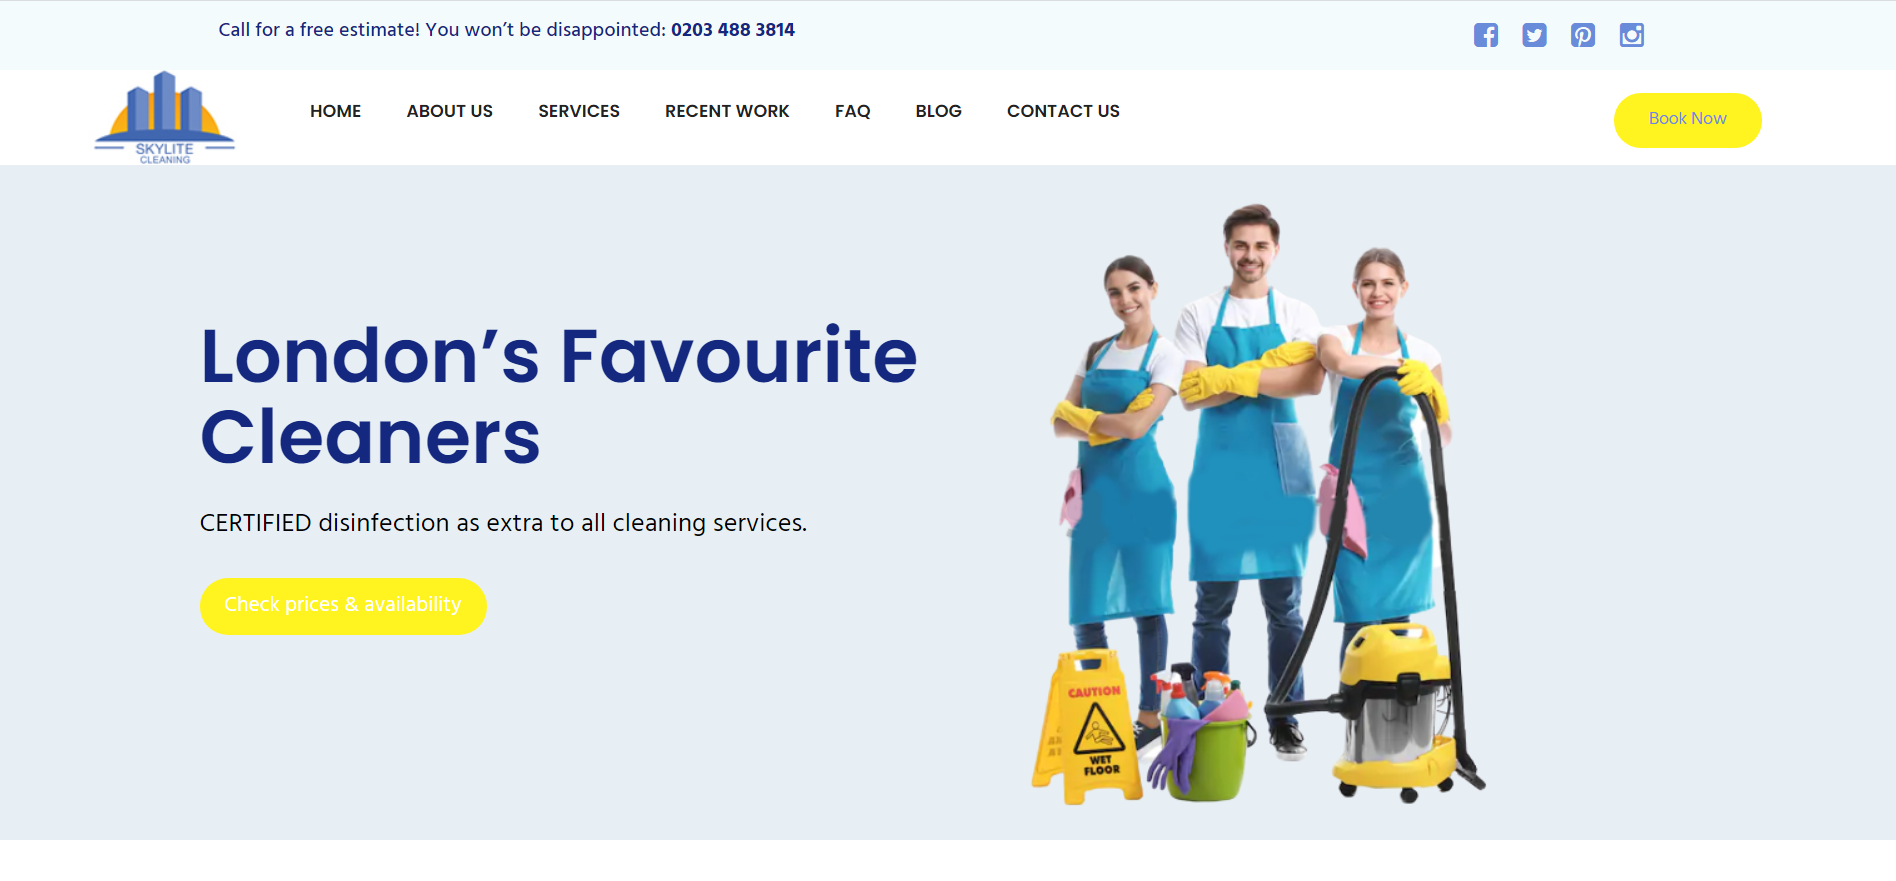 Skylite Cleaners